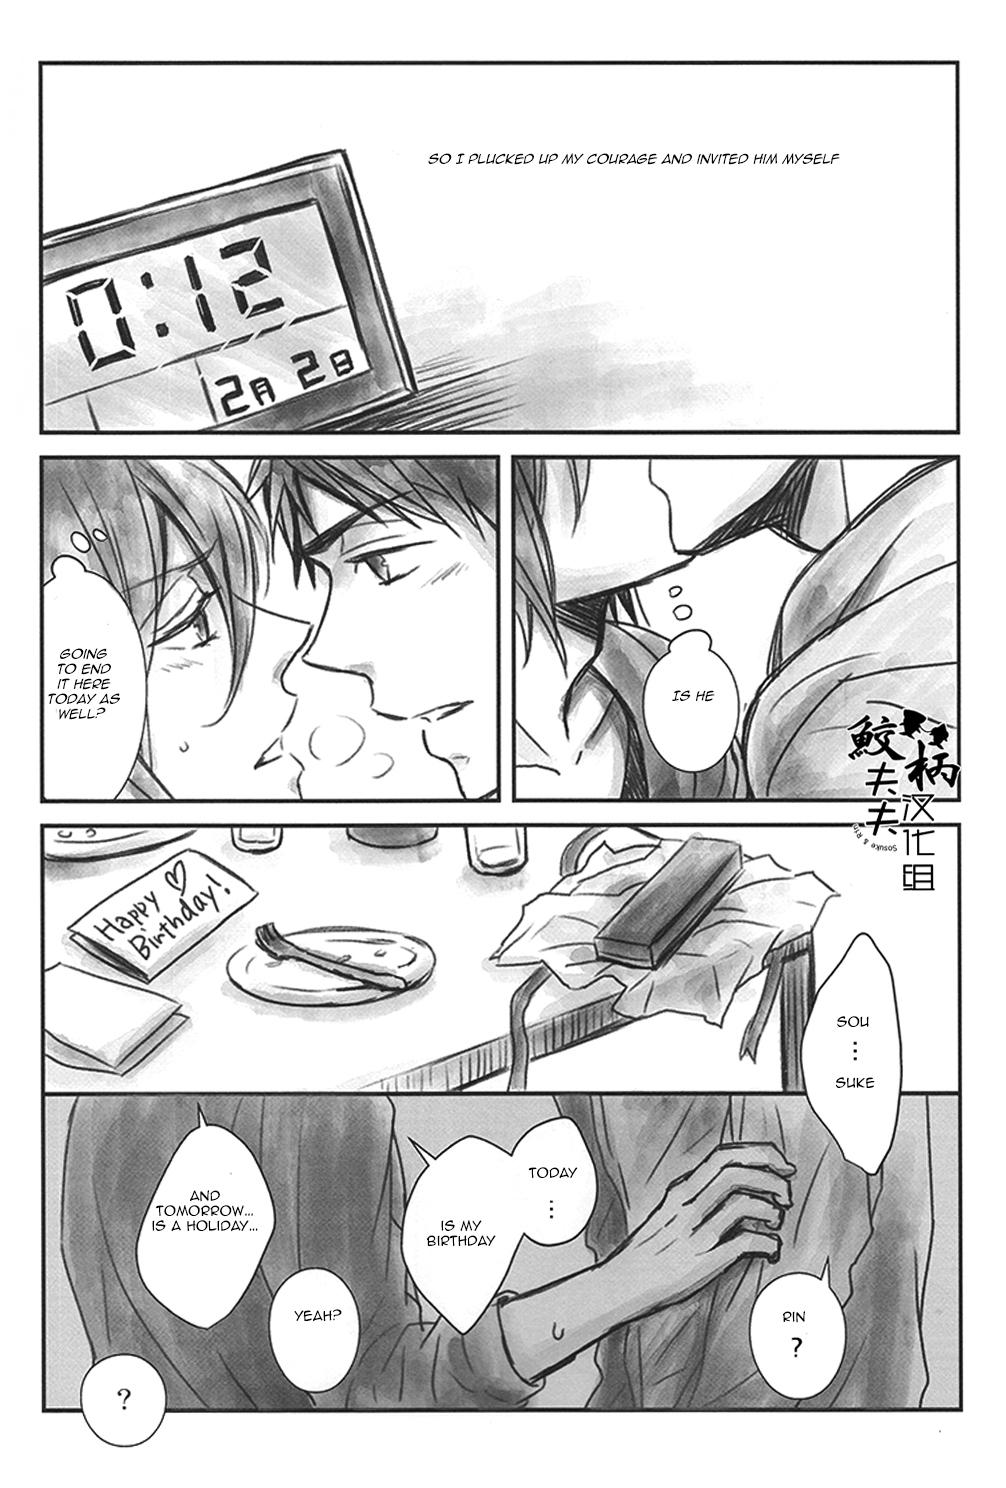 (Renai Jaws 4) [Lionni (Saaya)] 2-gatsu 2-ka no Hajimete | February Second for the First Time (Free!) [English] [Carrot-Bunny] 4